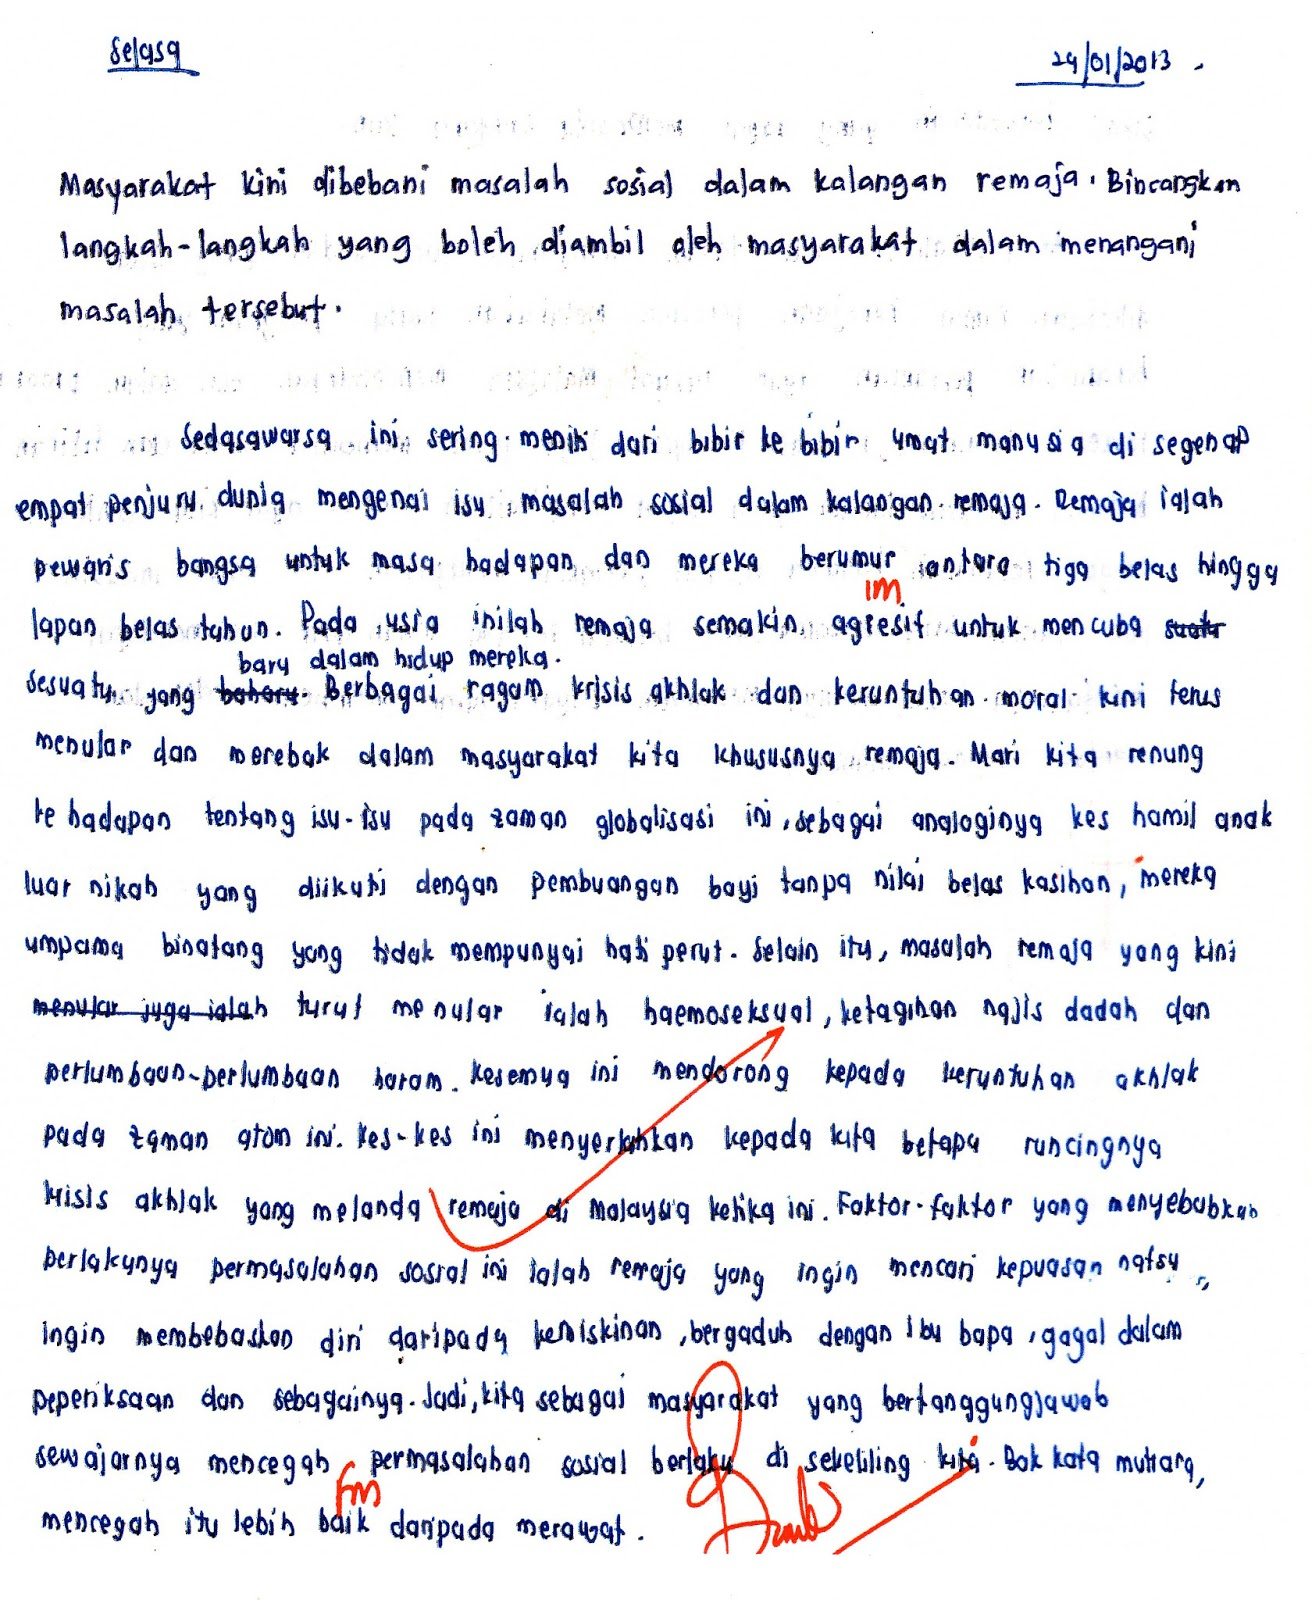 Macbeth summary essay